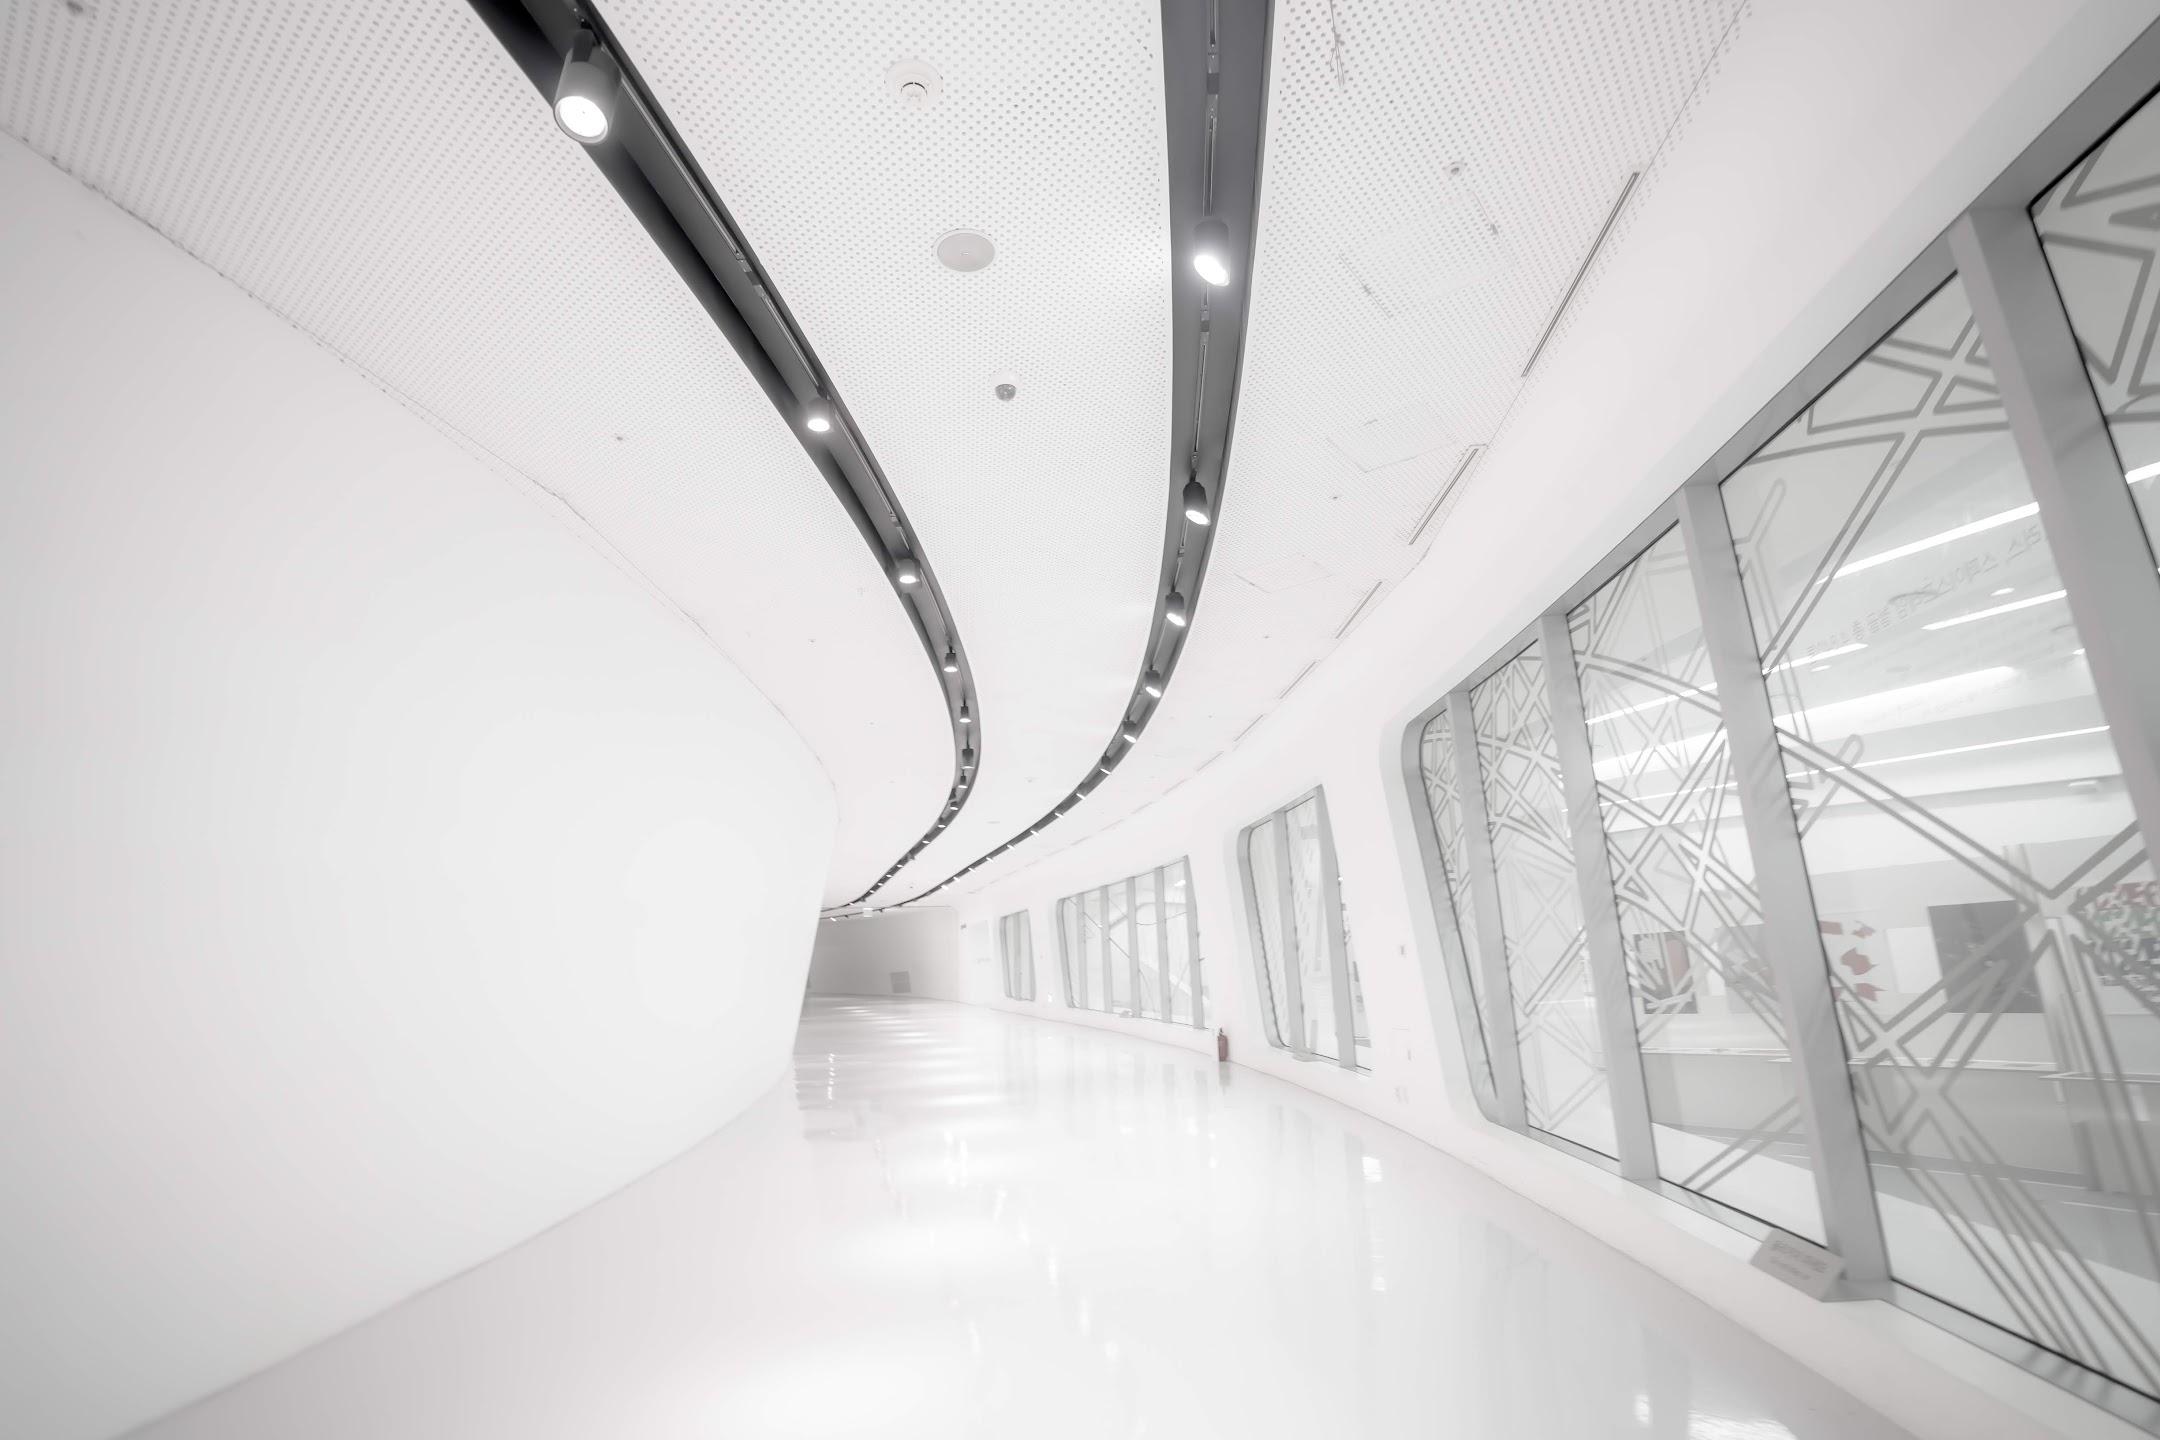 Seoul Dongdaemun Design Plaza (DDP)8